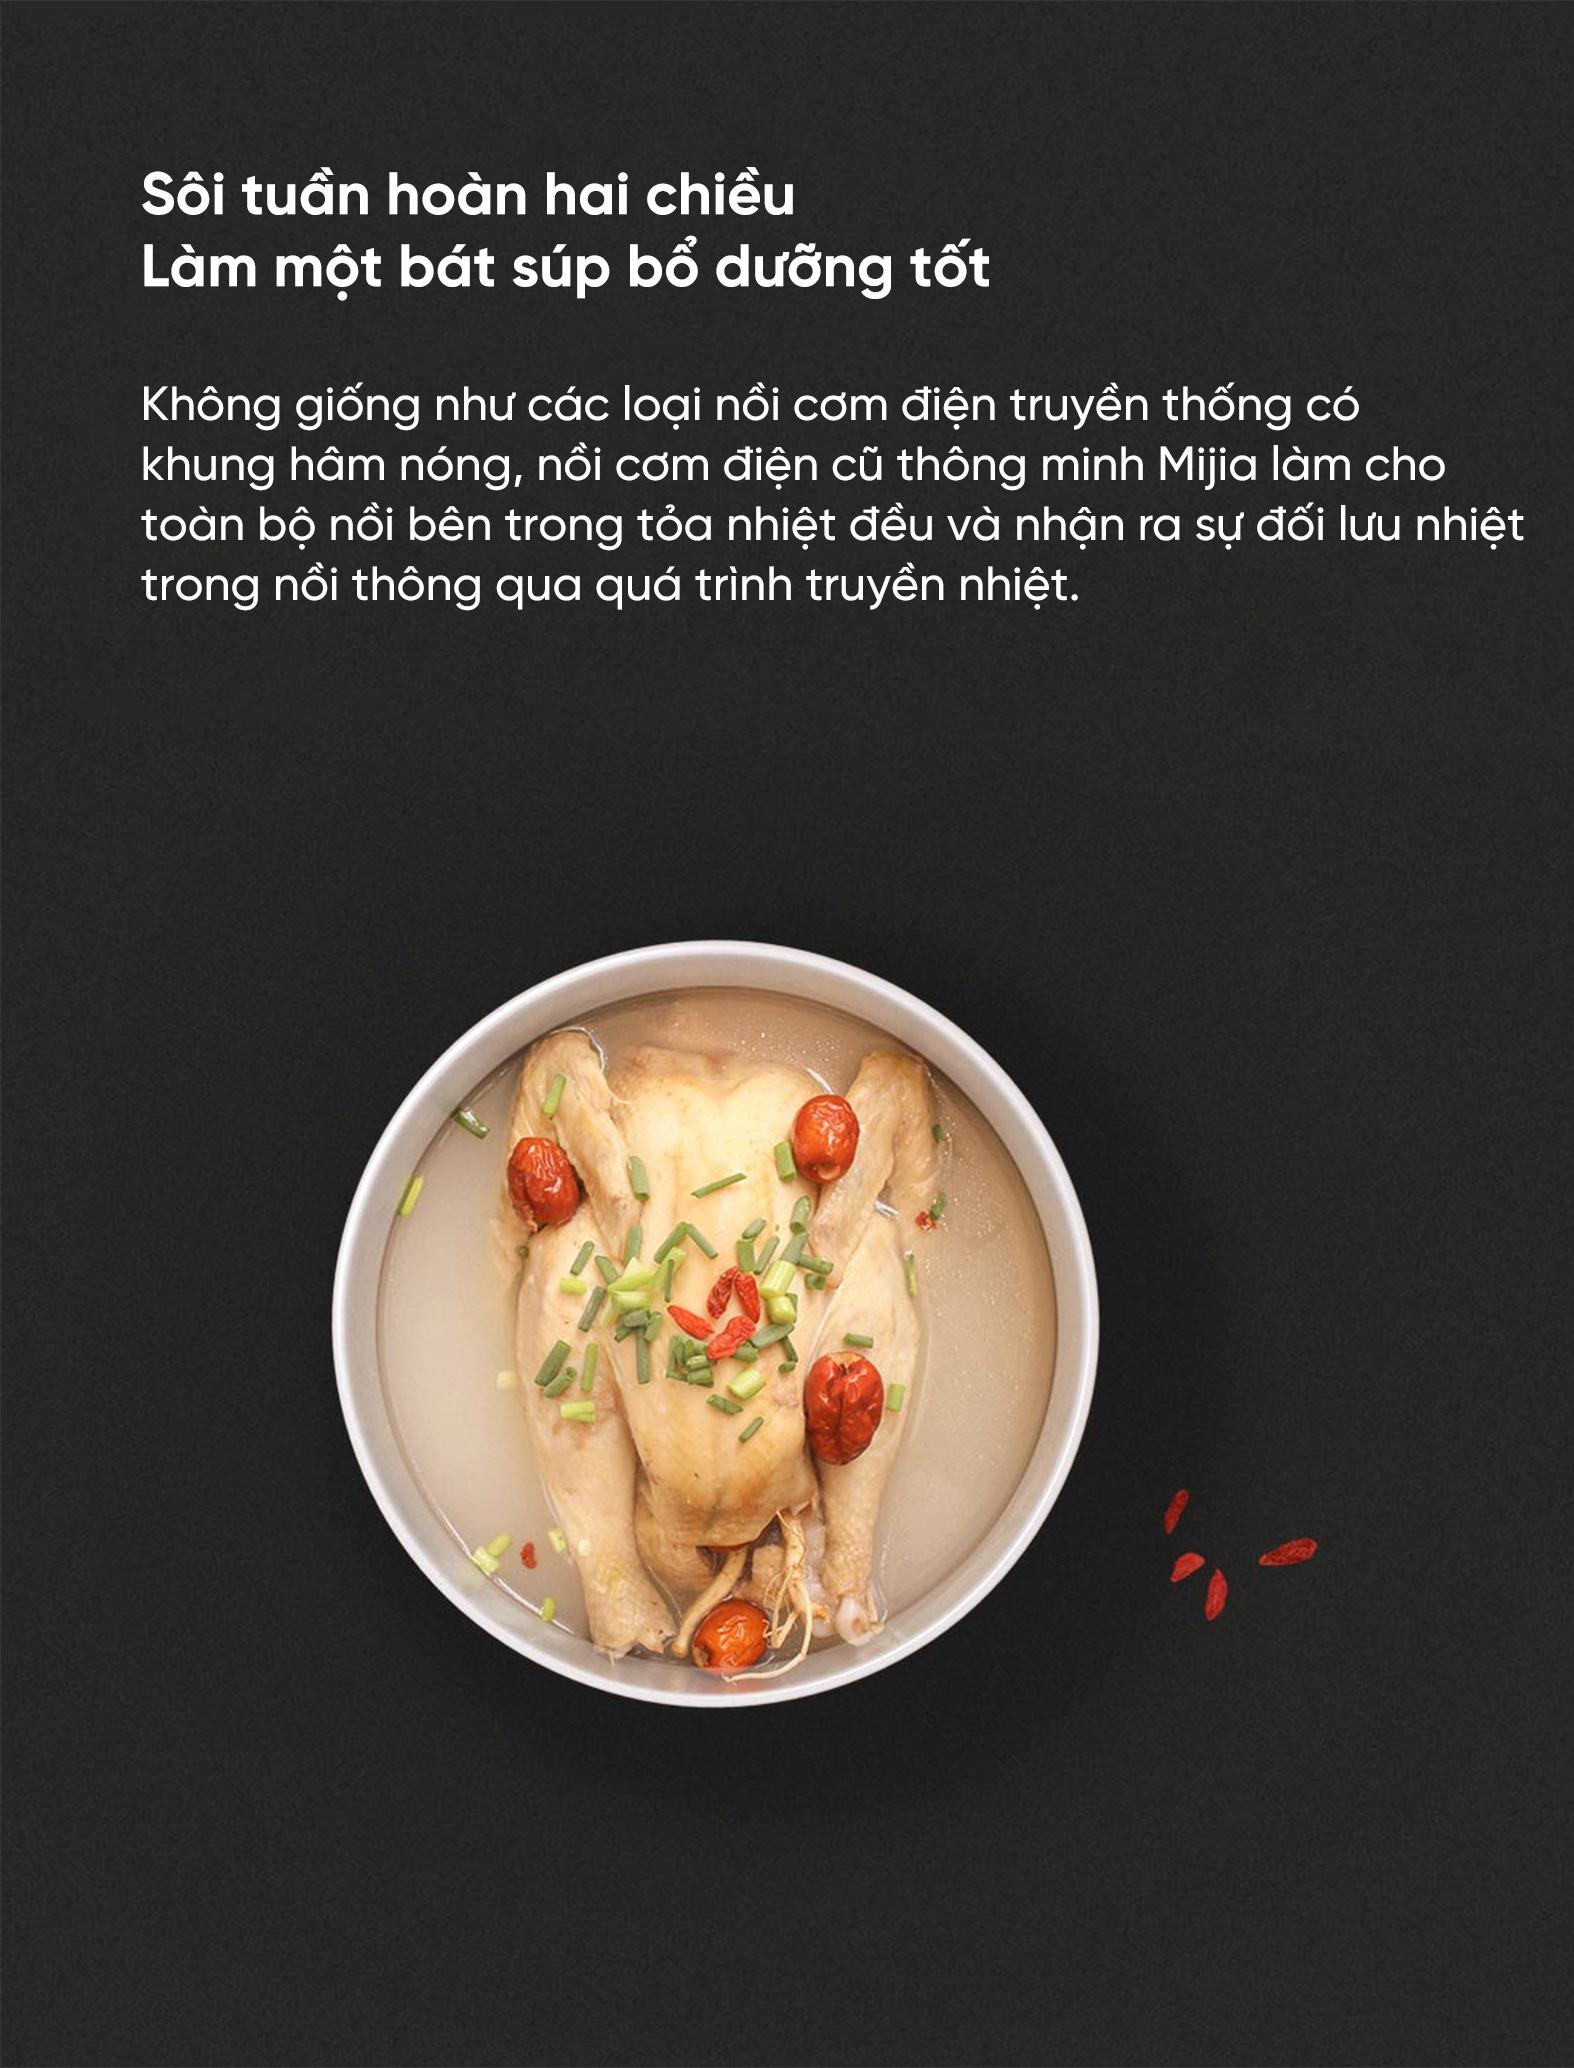 noi-com-dien-cao-tan-thong-minh-xiaomi-4l-IHFB02CM-12